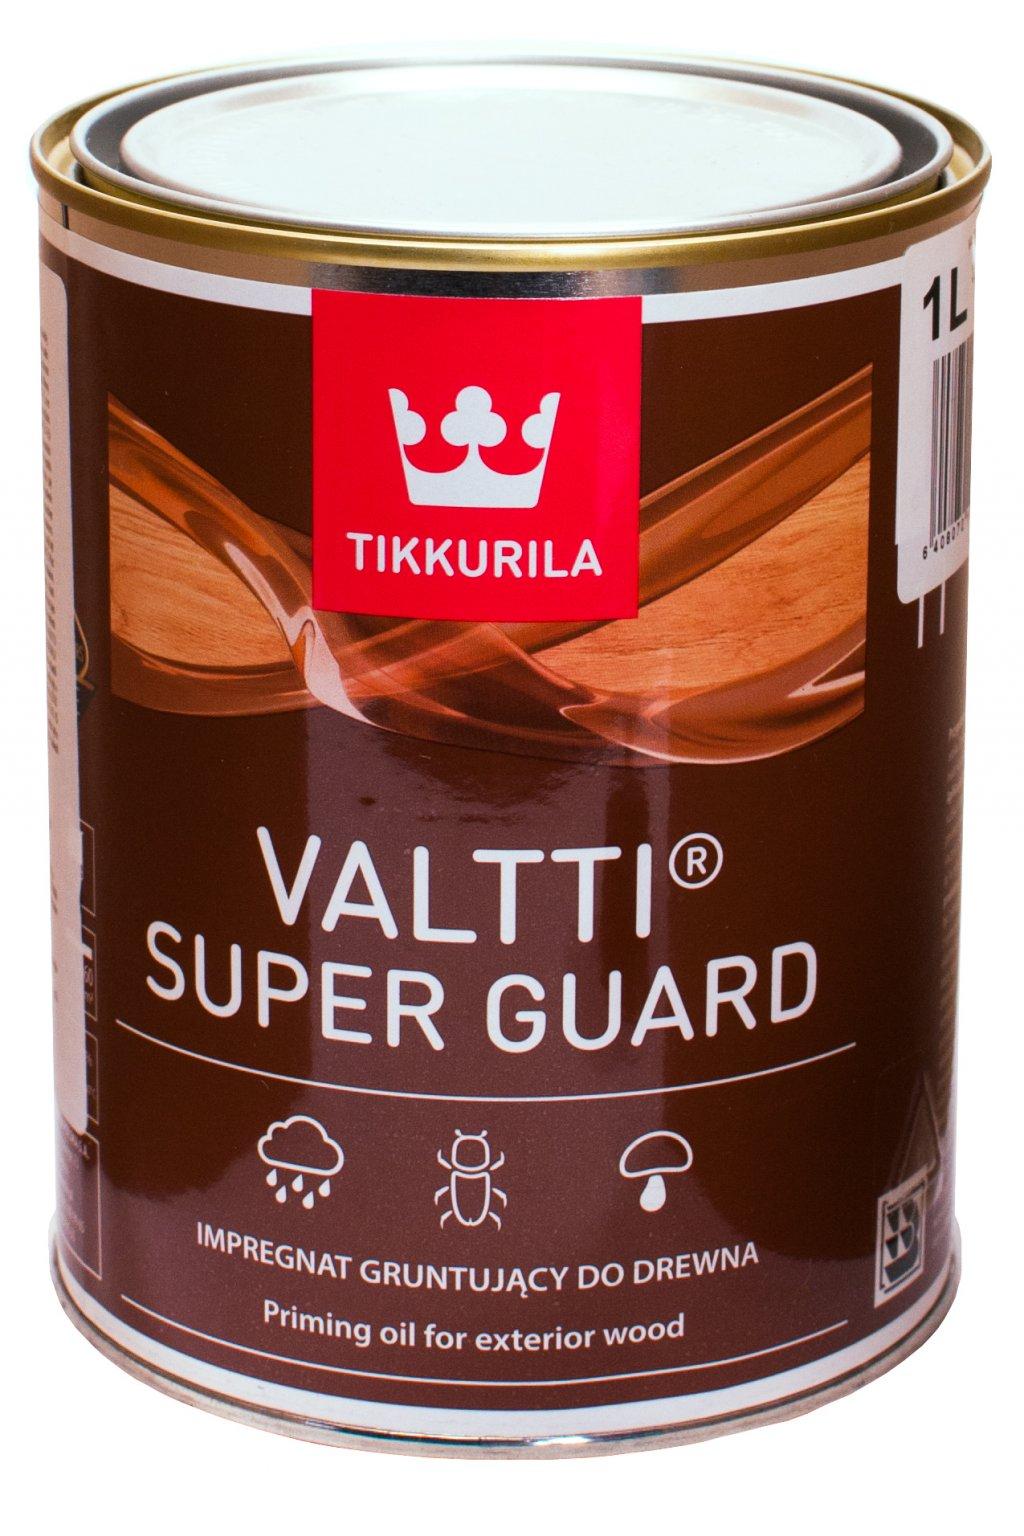 09 VALTTI SUPER GUARD 1L na WEB